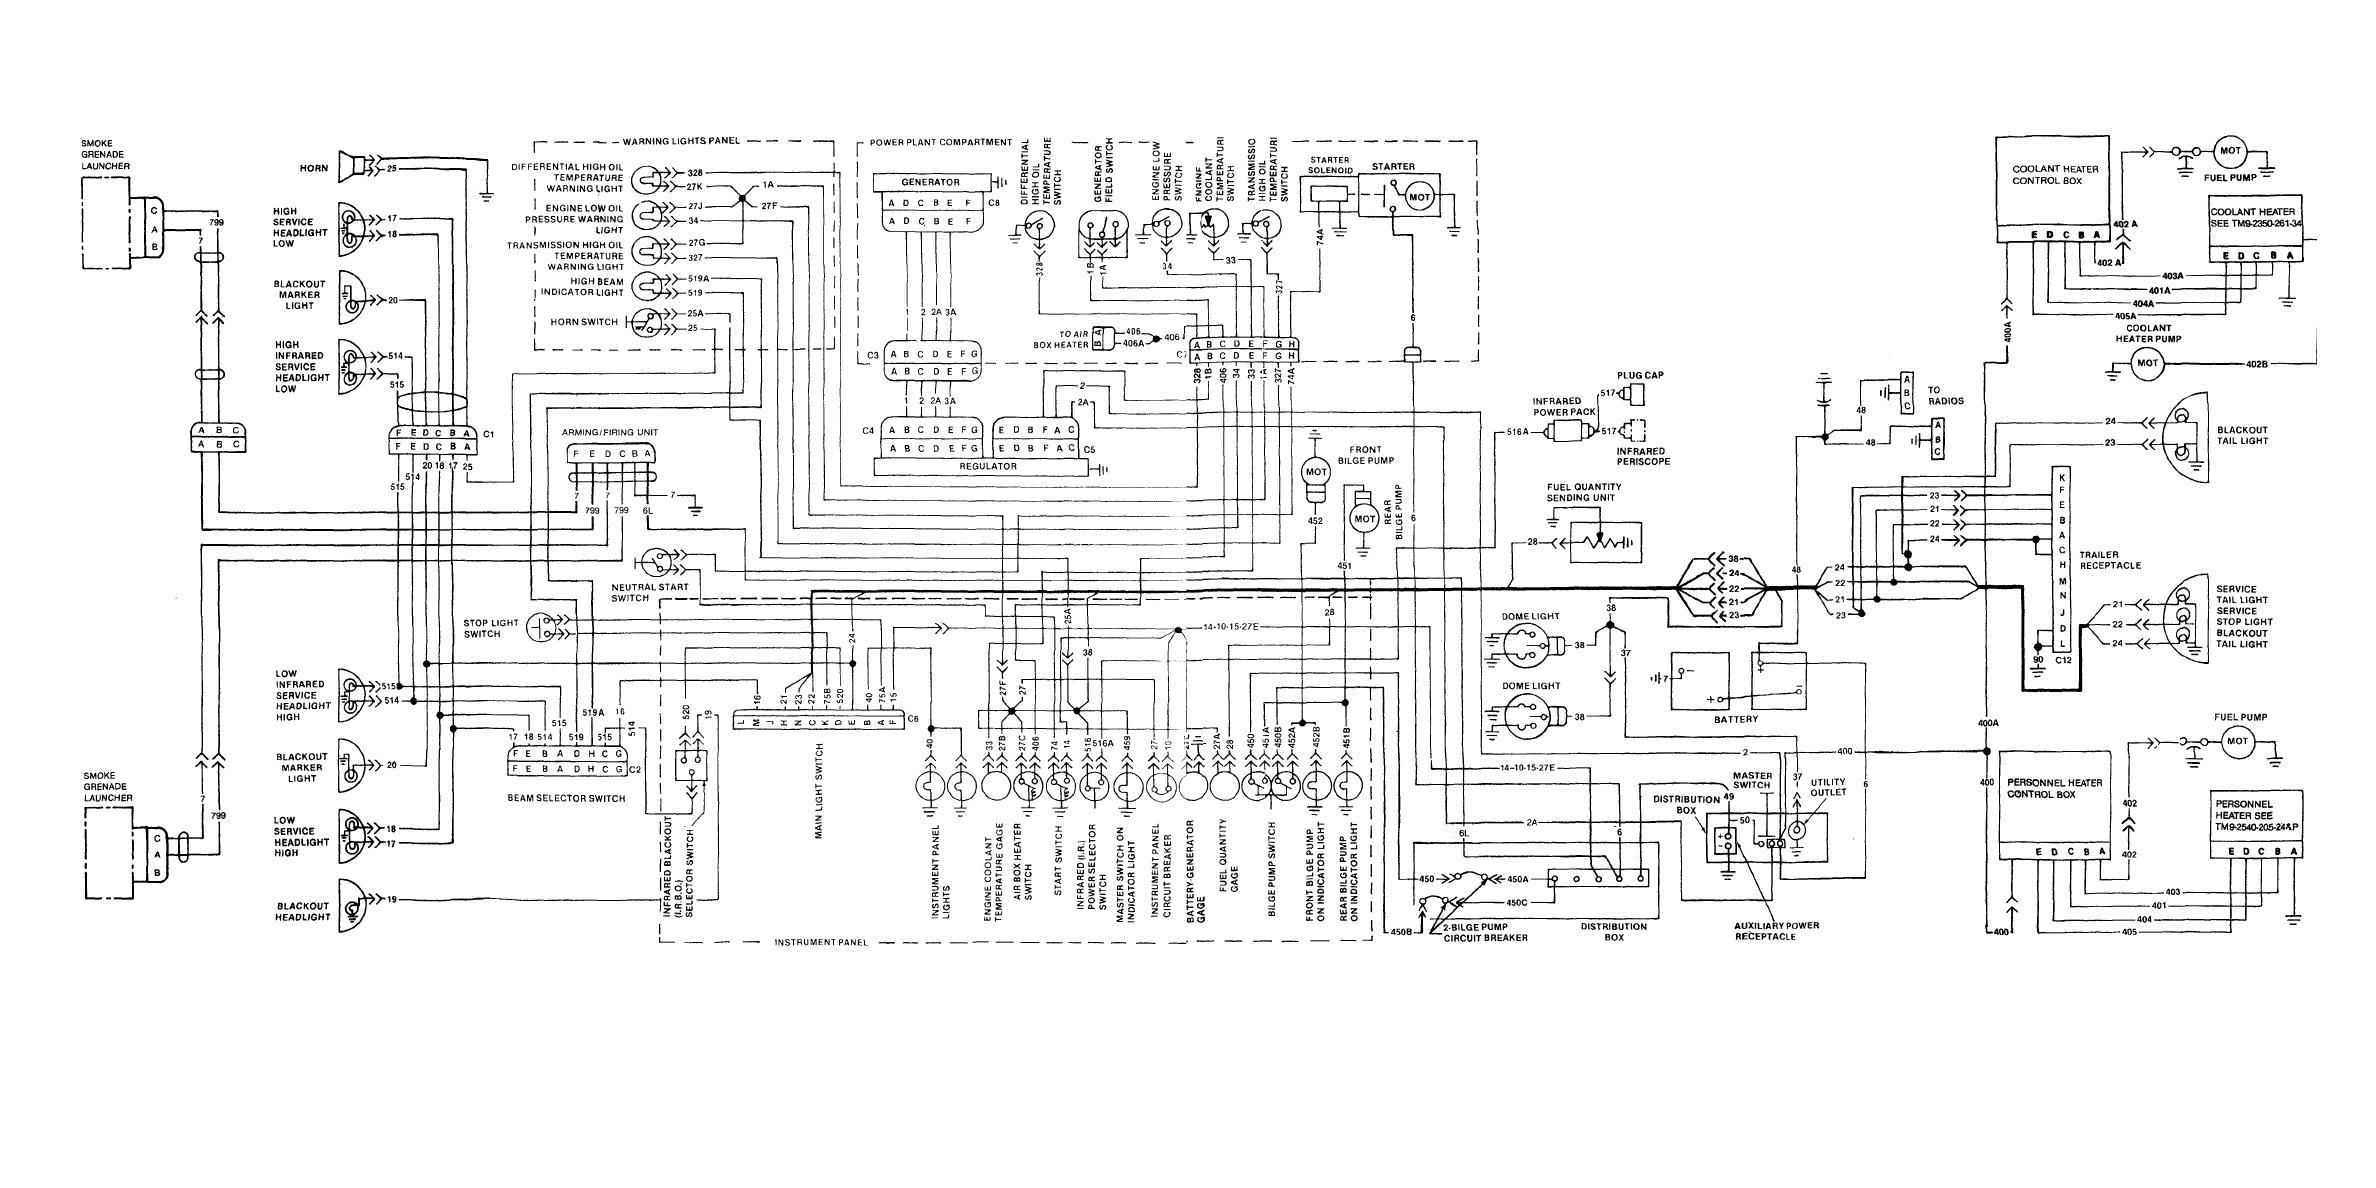 Limitorque Mx Wiring Diagram 20  Limitorque Mx Wiring